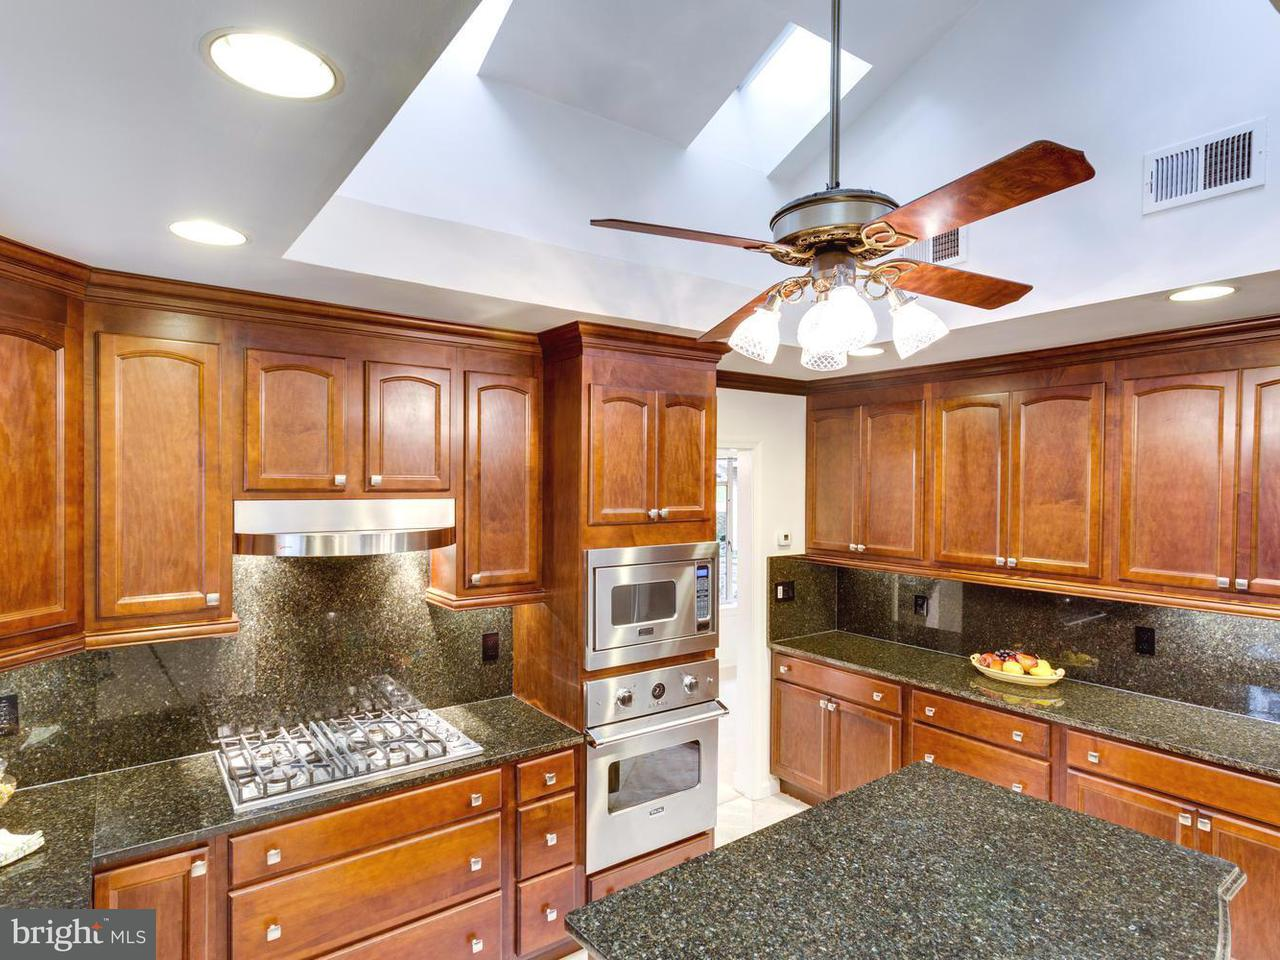 Single Family Home for Sale at 2338 S PIERCE Street 2338 S PIERCE Street Arlington, Virginia 22202 United States